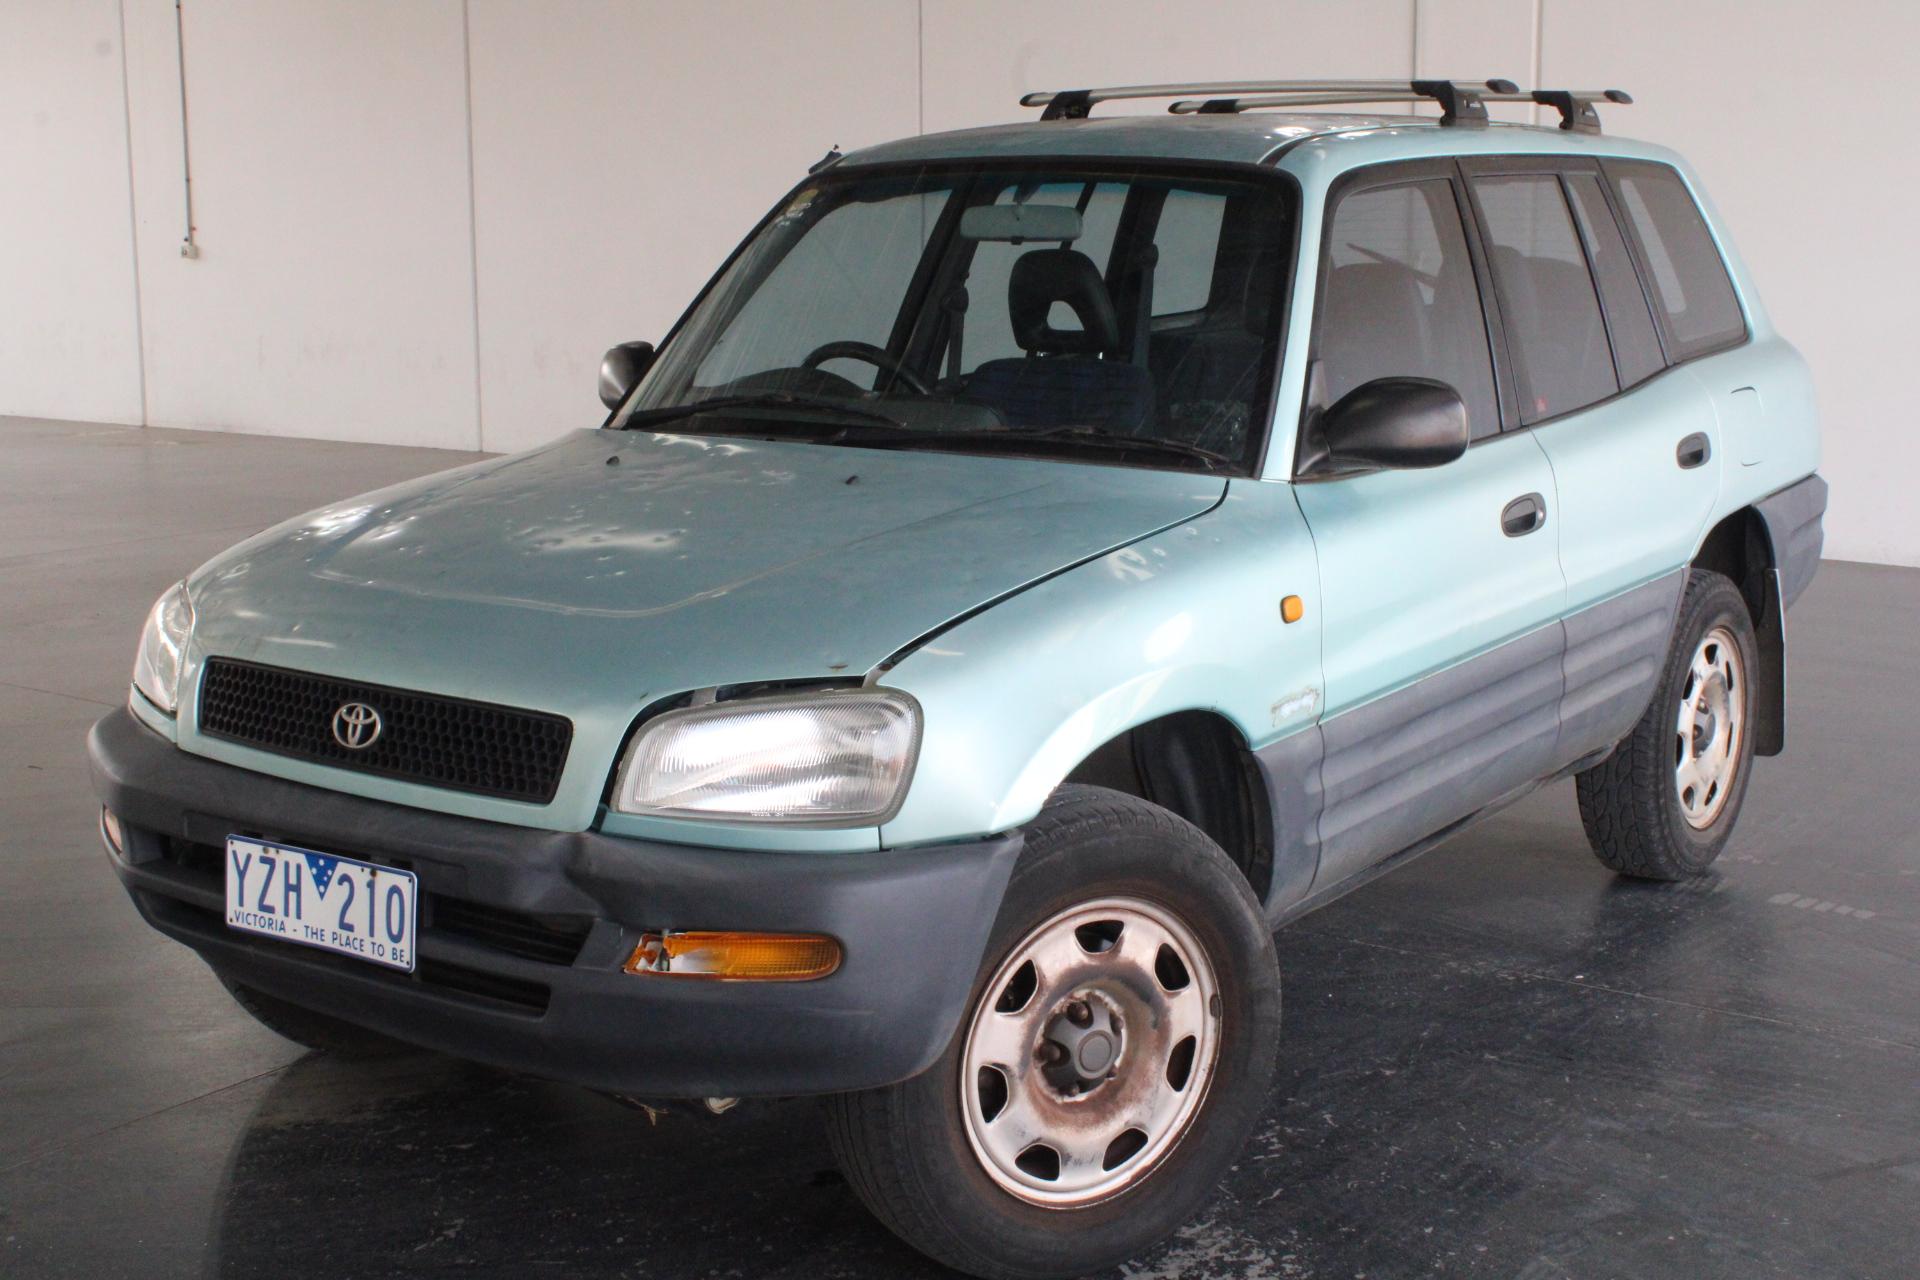 1997 Toyota Rav 4 (4x4) SXA11R Automatic Wagon (WOVR Inspected)